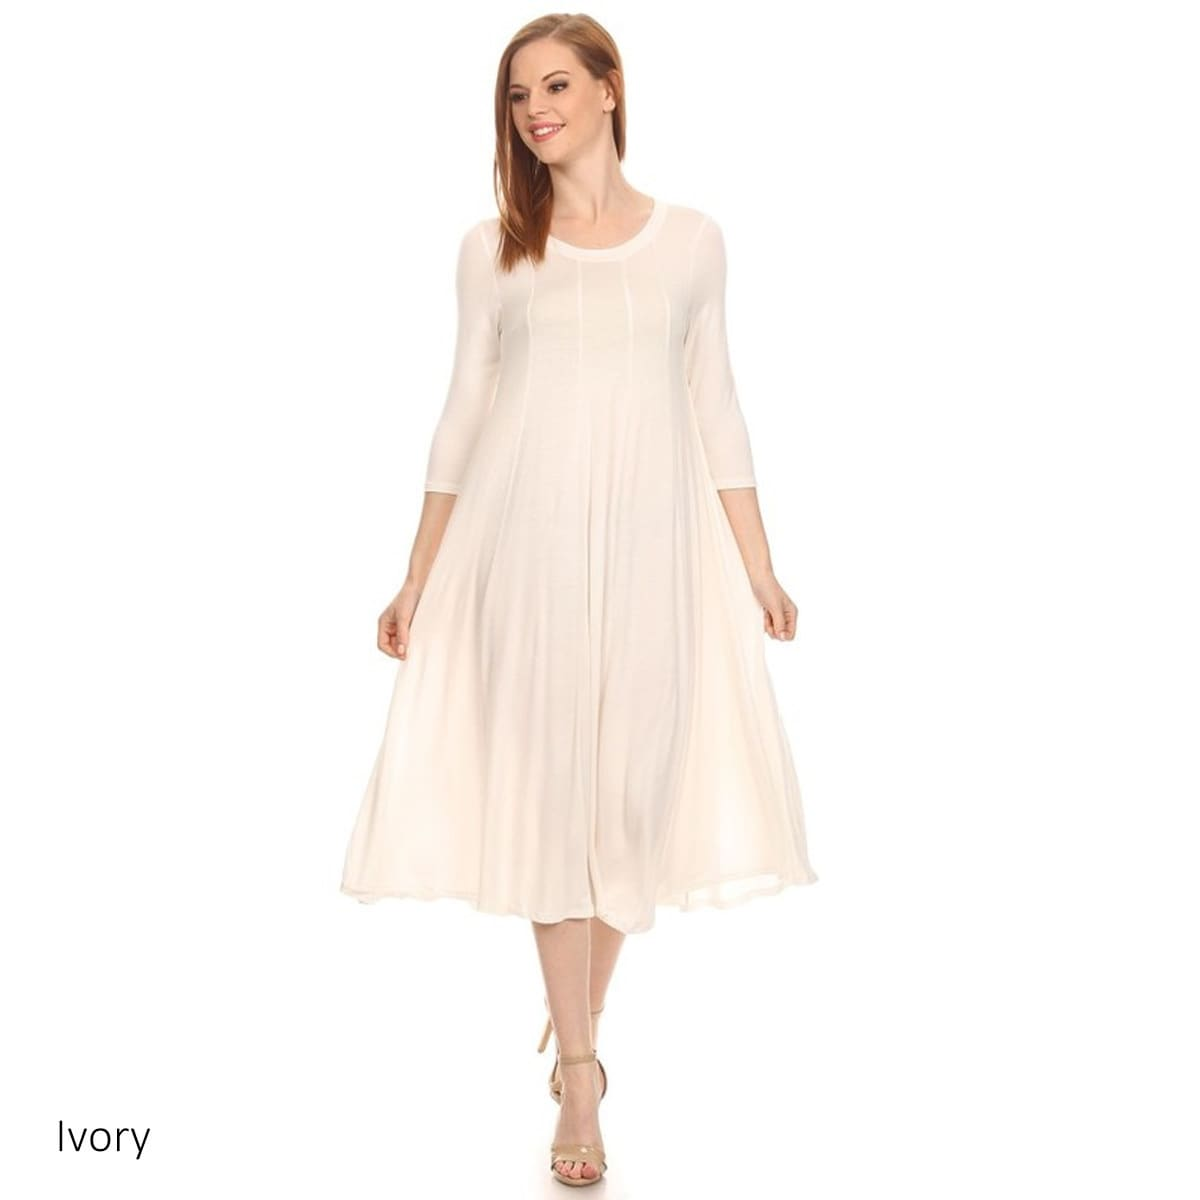 Women's Heather Rayon/Spandex Baby Doll Dress (Ivory-Medi...